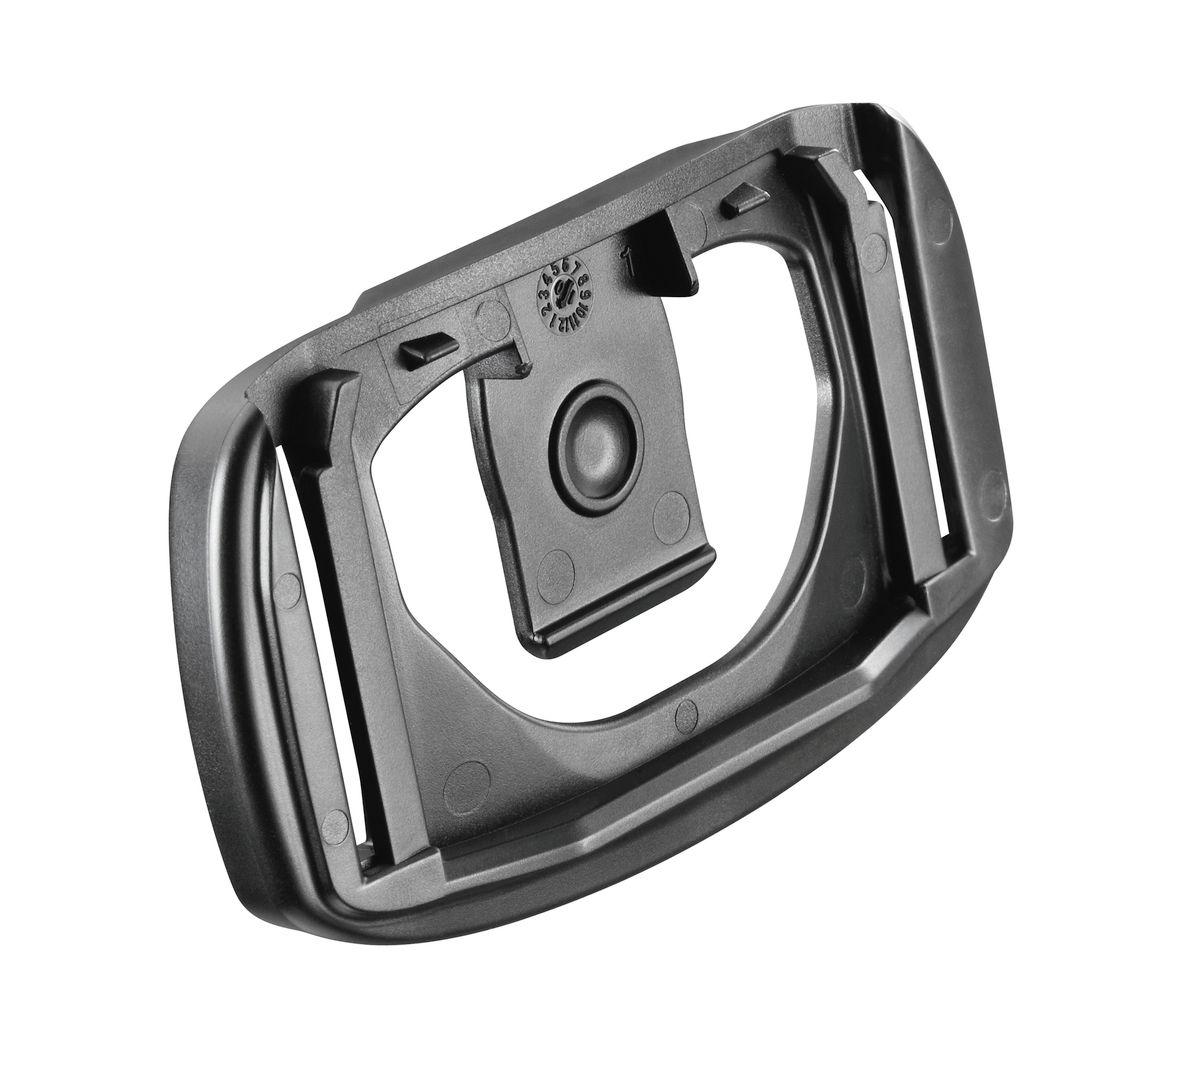 Supporto clip casco PIXA®